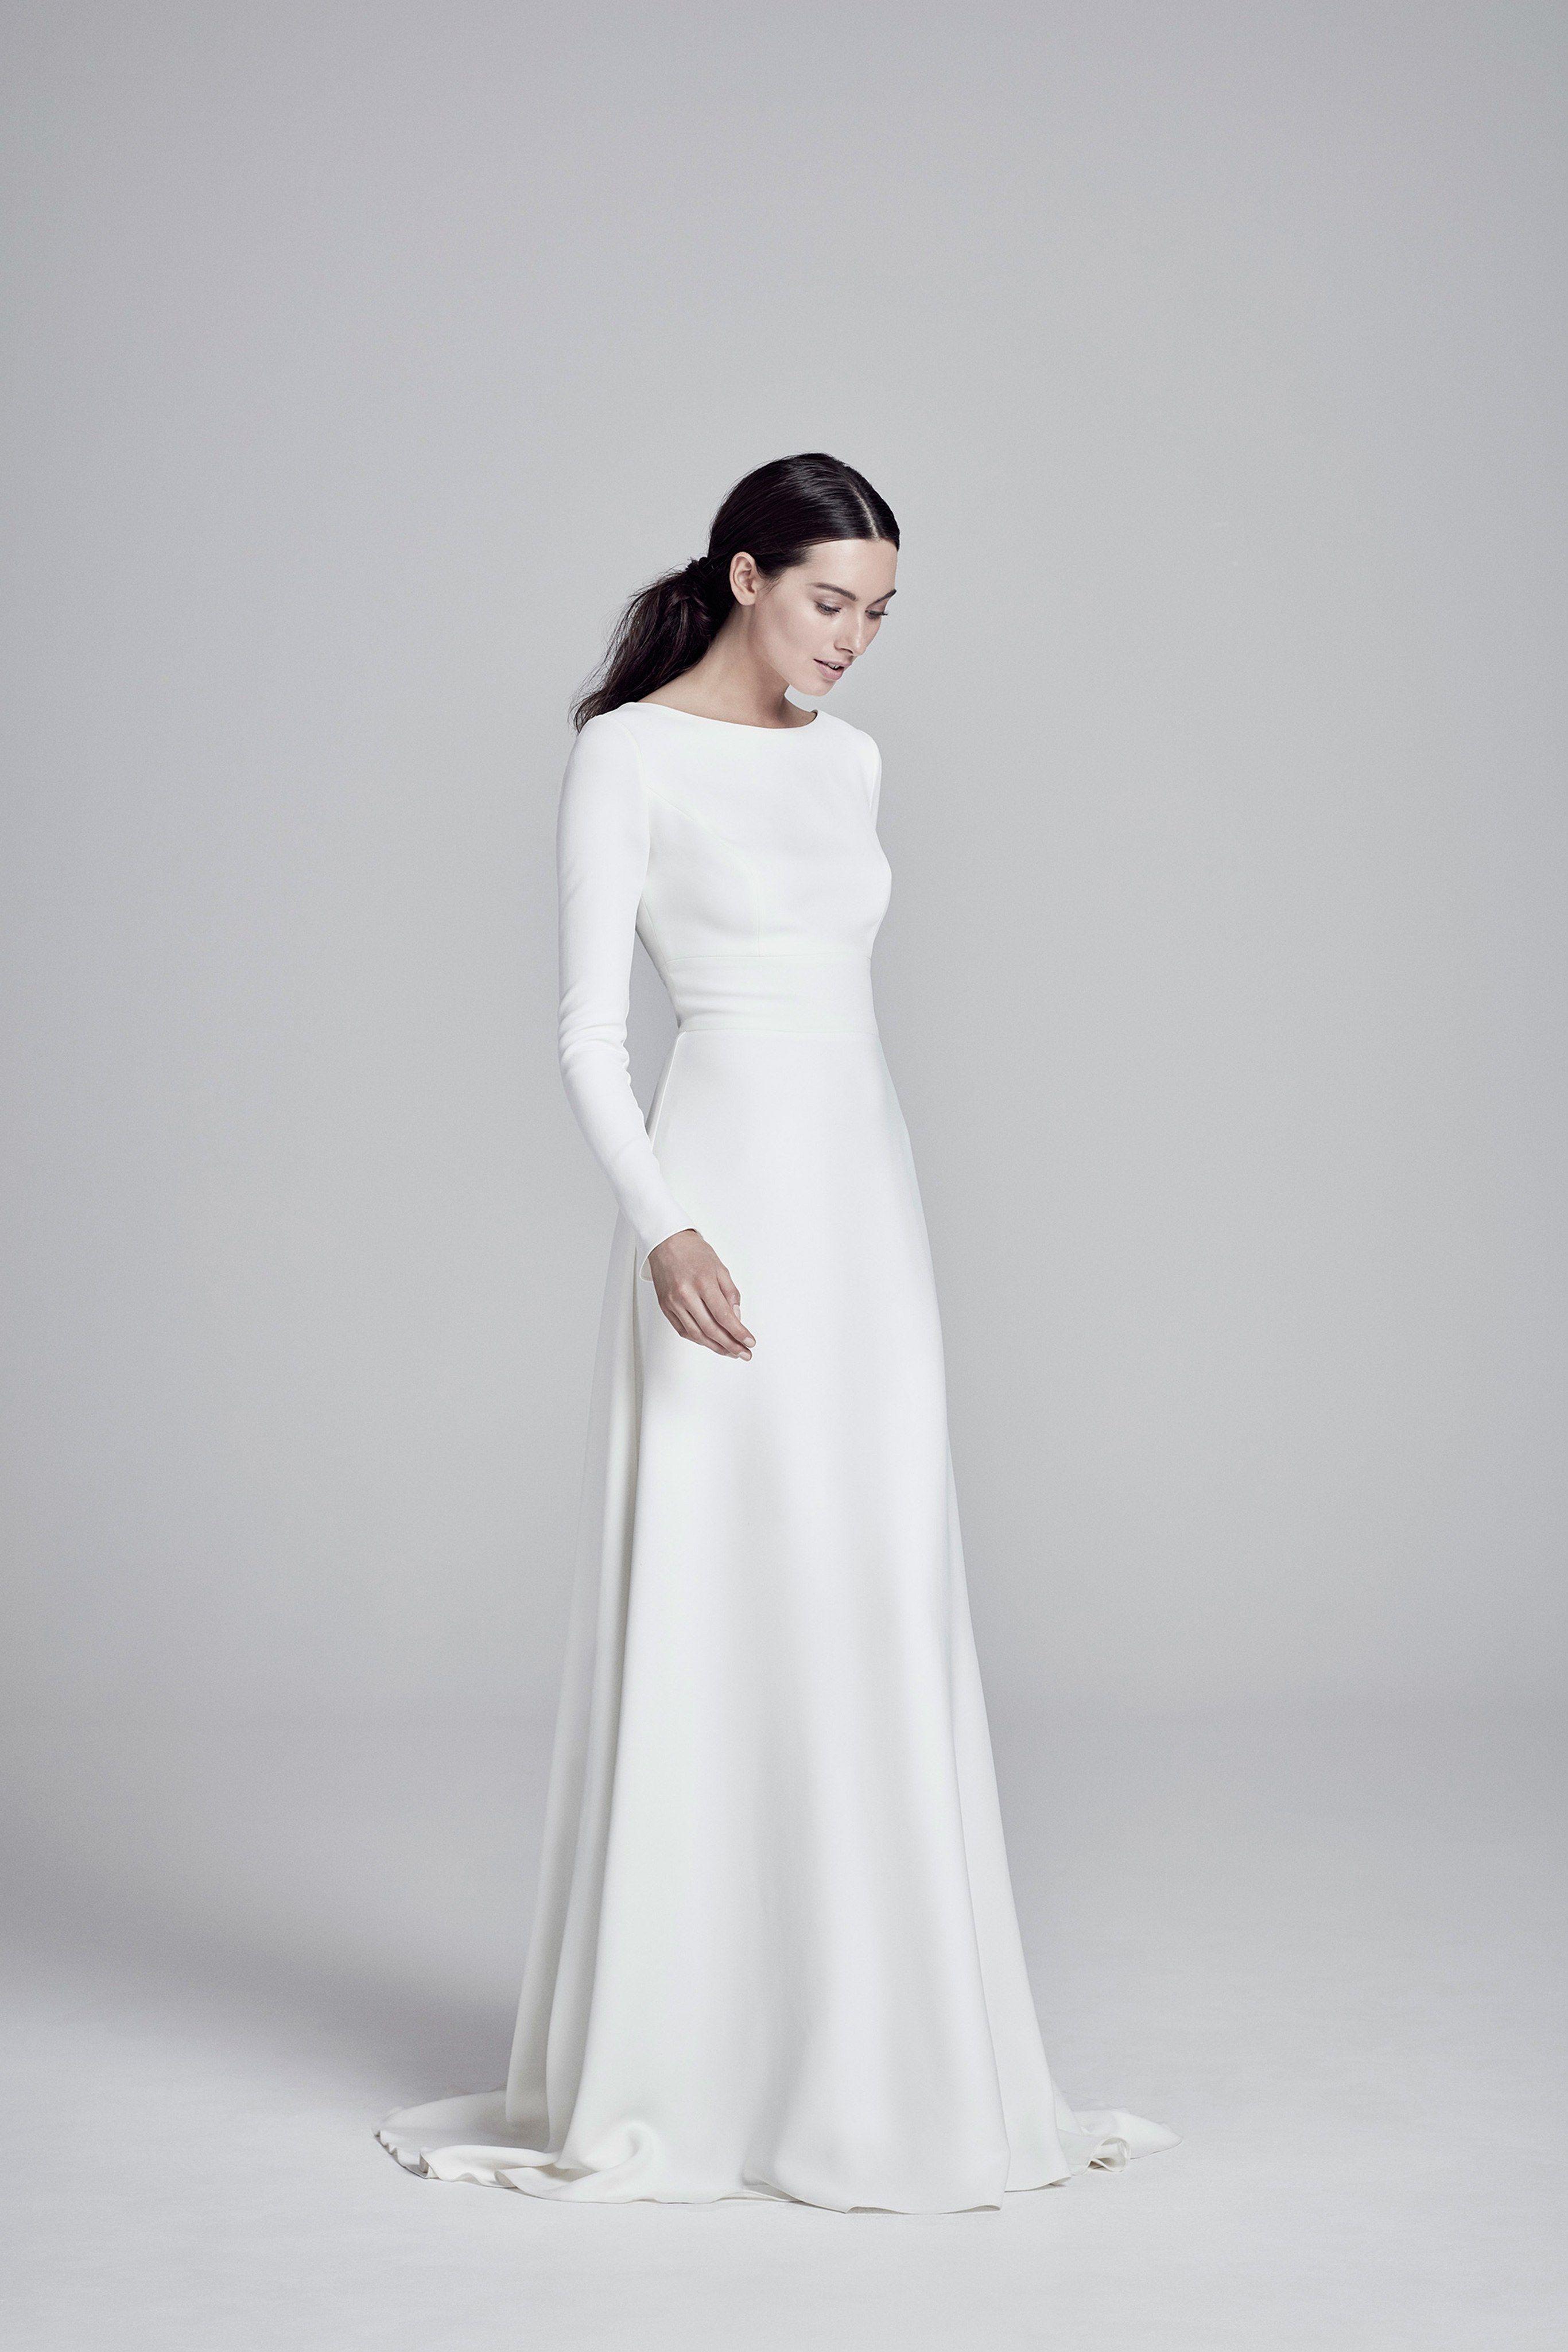 Suzanne Neville Bridal Spring 2020 Fashion Show Wedding Dress Long Sleeve Suzanne Neville Wedding Dresses Minimalist Wedding Dresses [ 4098 x 2732 Pixel ]